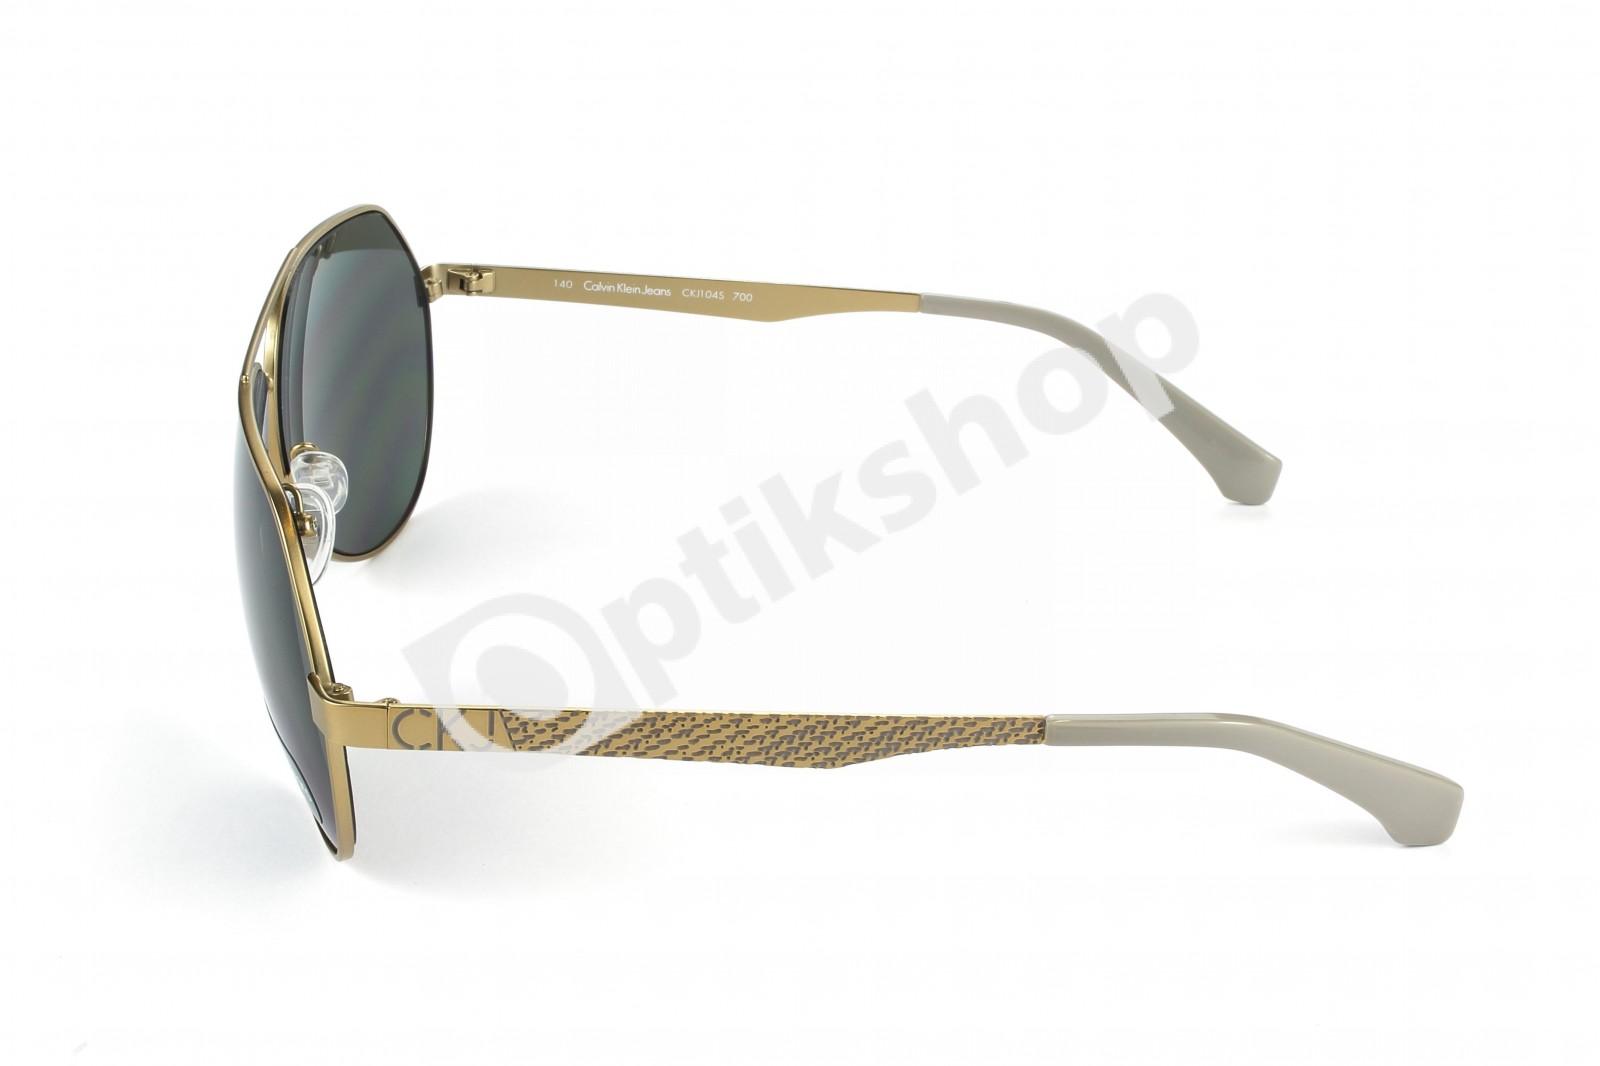 4f2cc0be51 Calvin Klein napszemüveg; Calvin Klein napszemüveg; Calvin Klein napszemüveg